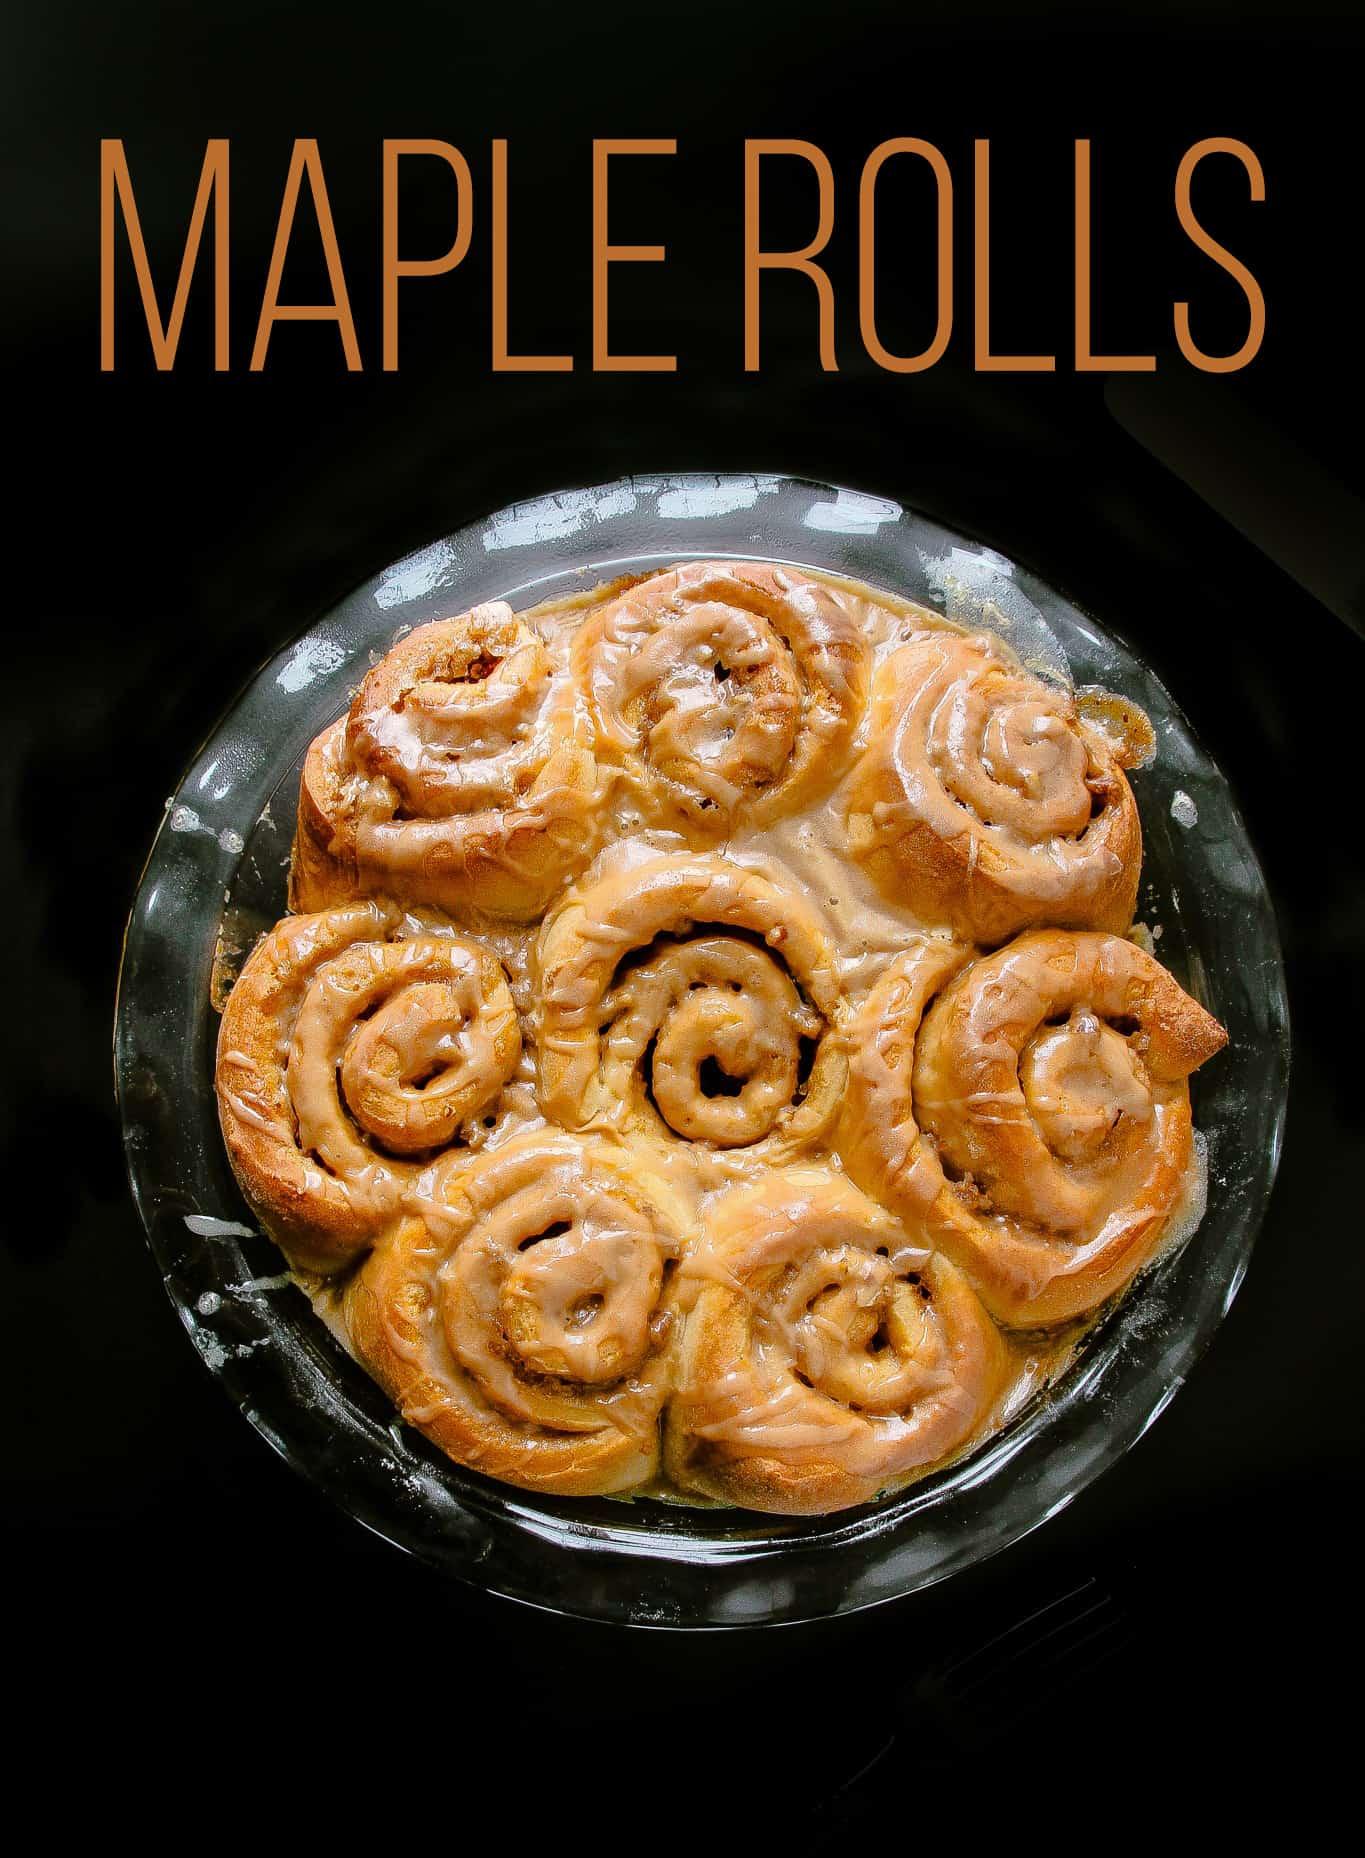 maple-rolls-5 copy